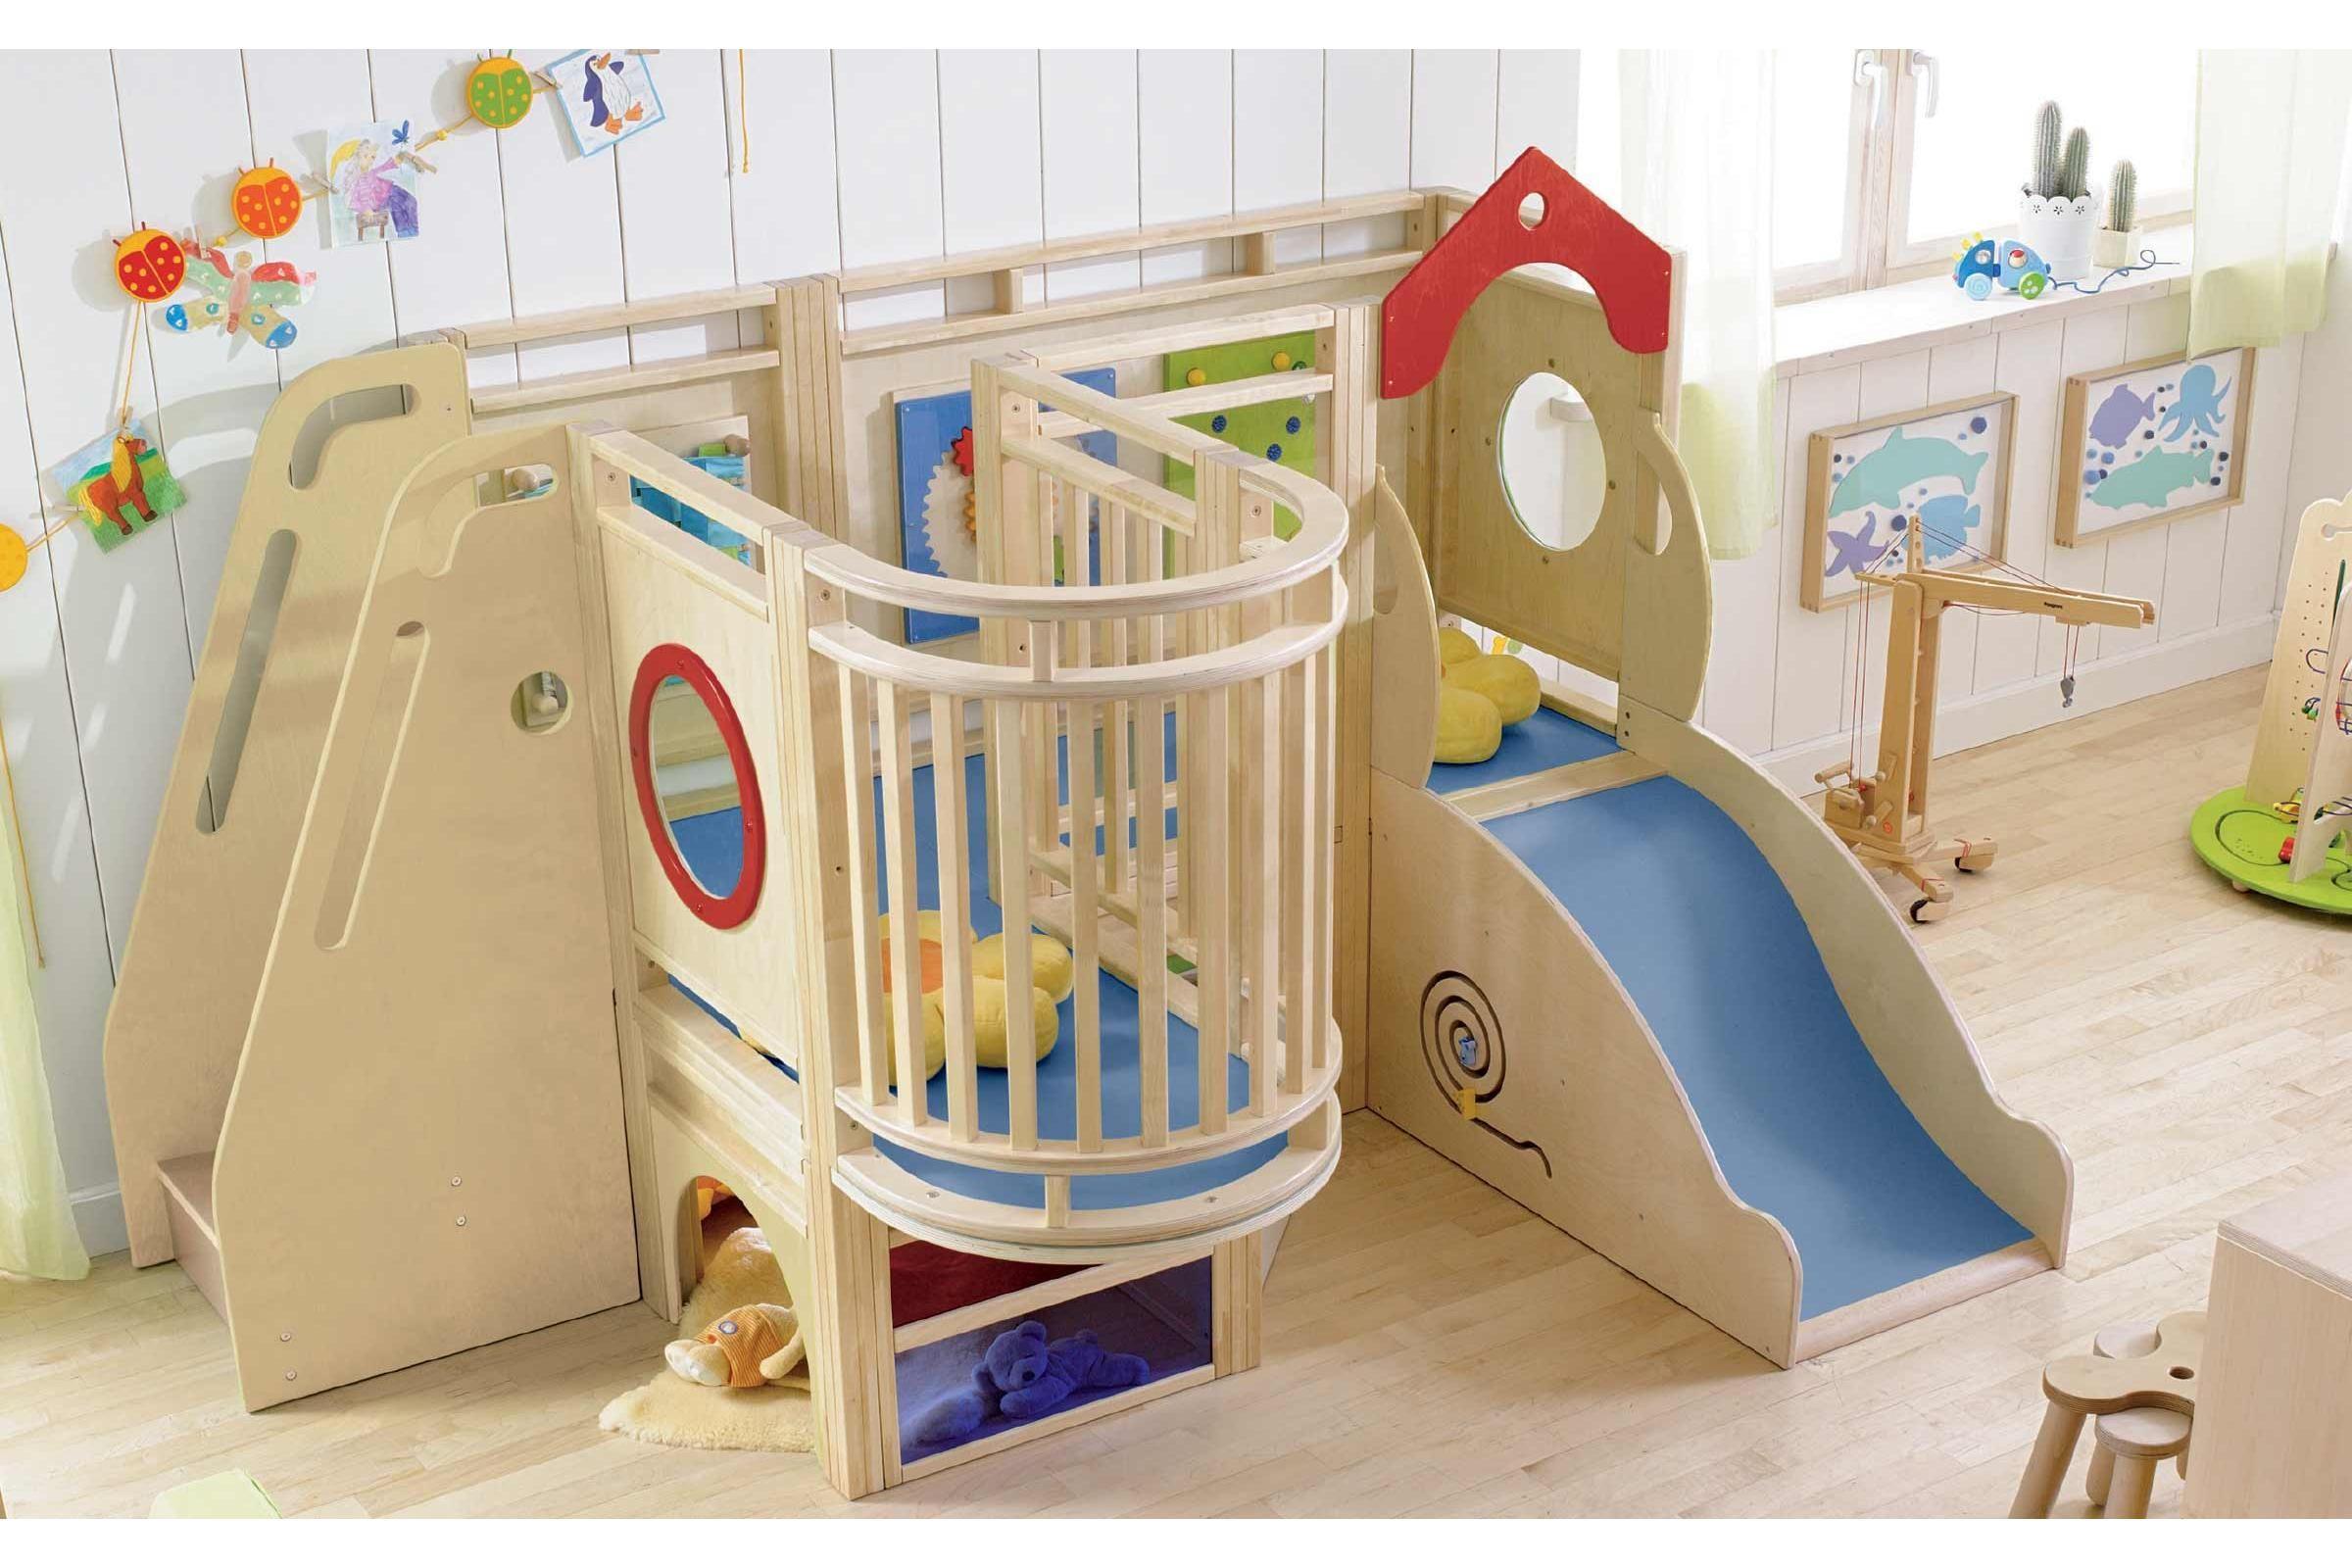 Snail House Toddler Modular Activity Play Loft | Grocare New ...